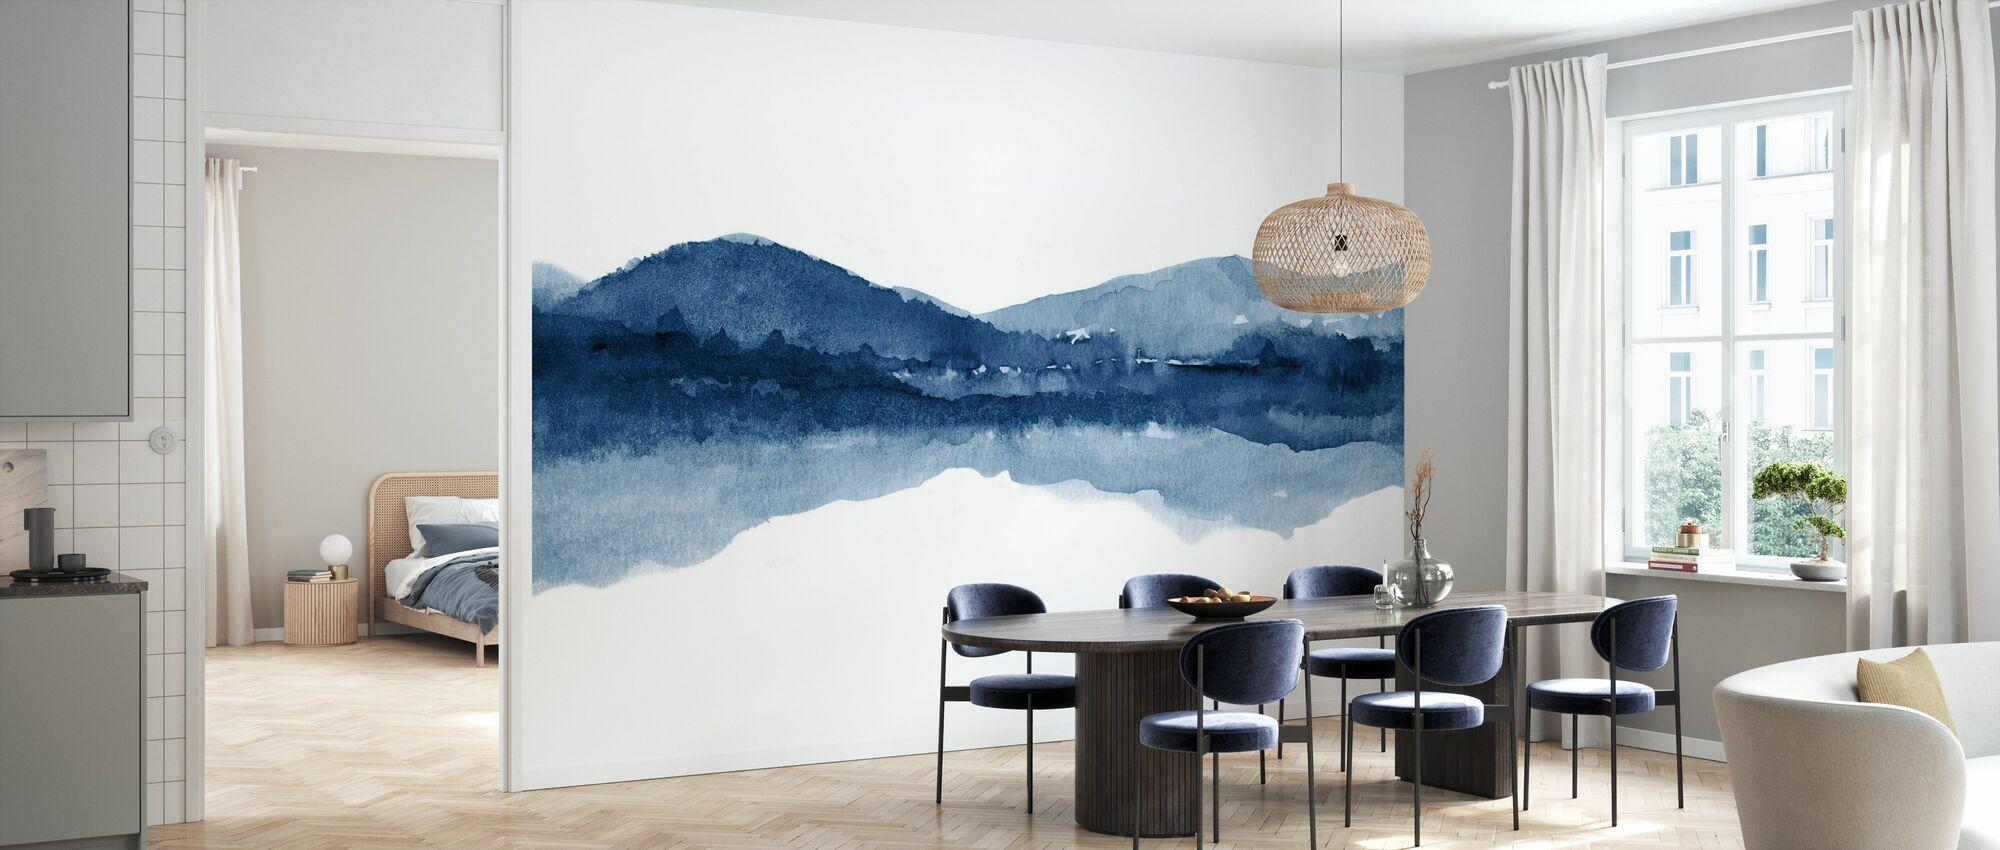 Akvarell Landskap I - Marinblå - Tapet - Kök